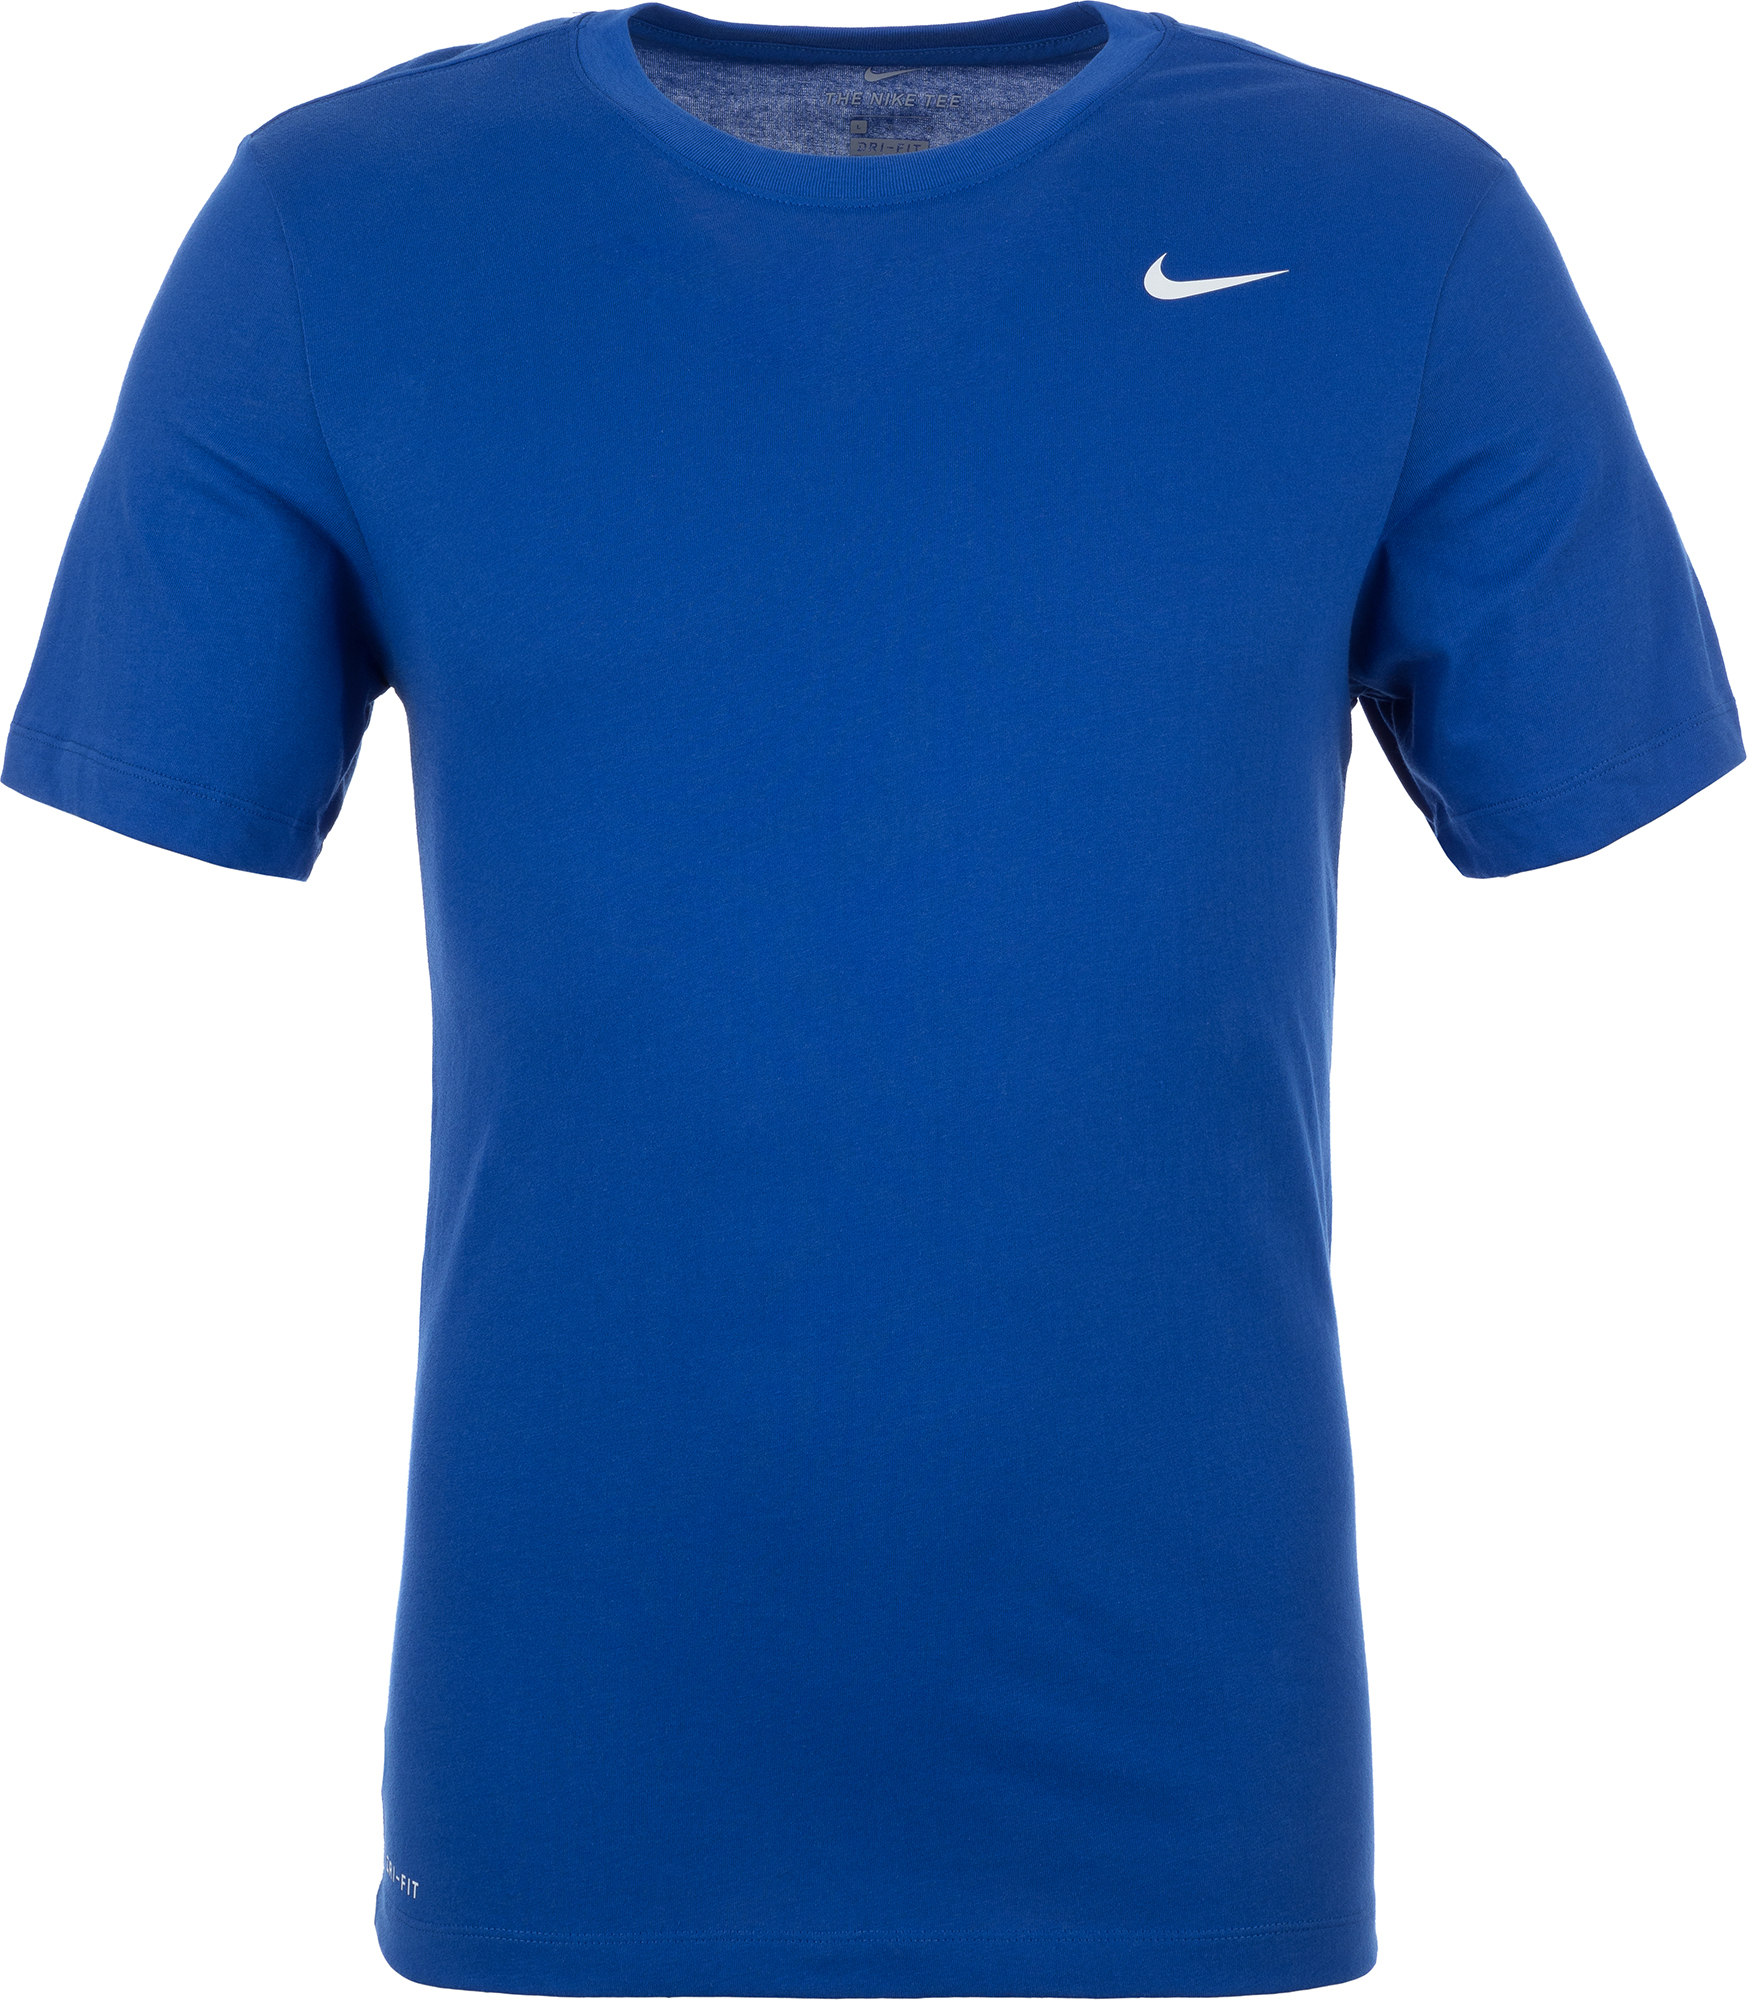 Nike Футболка мужская Dri-FIT, размер 44-46